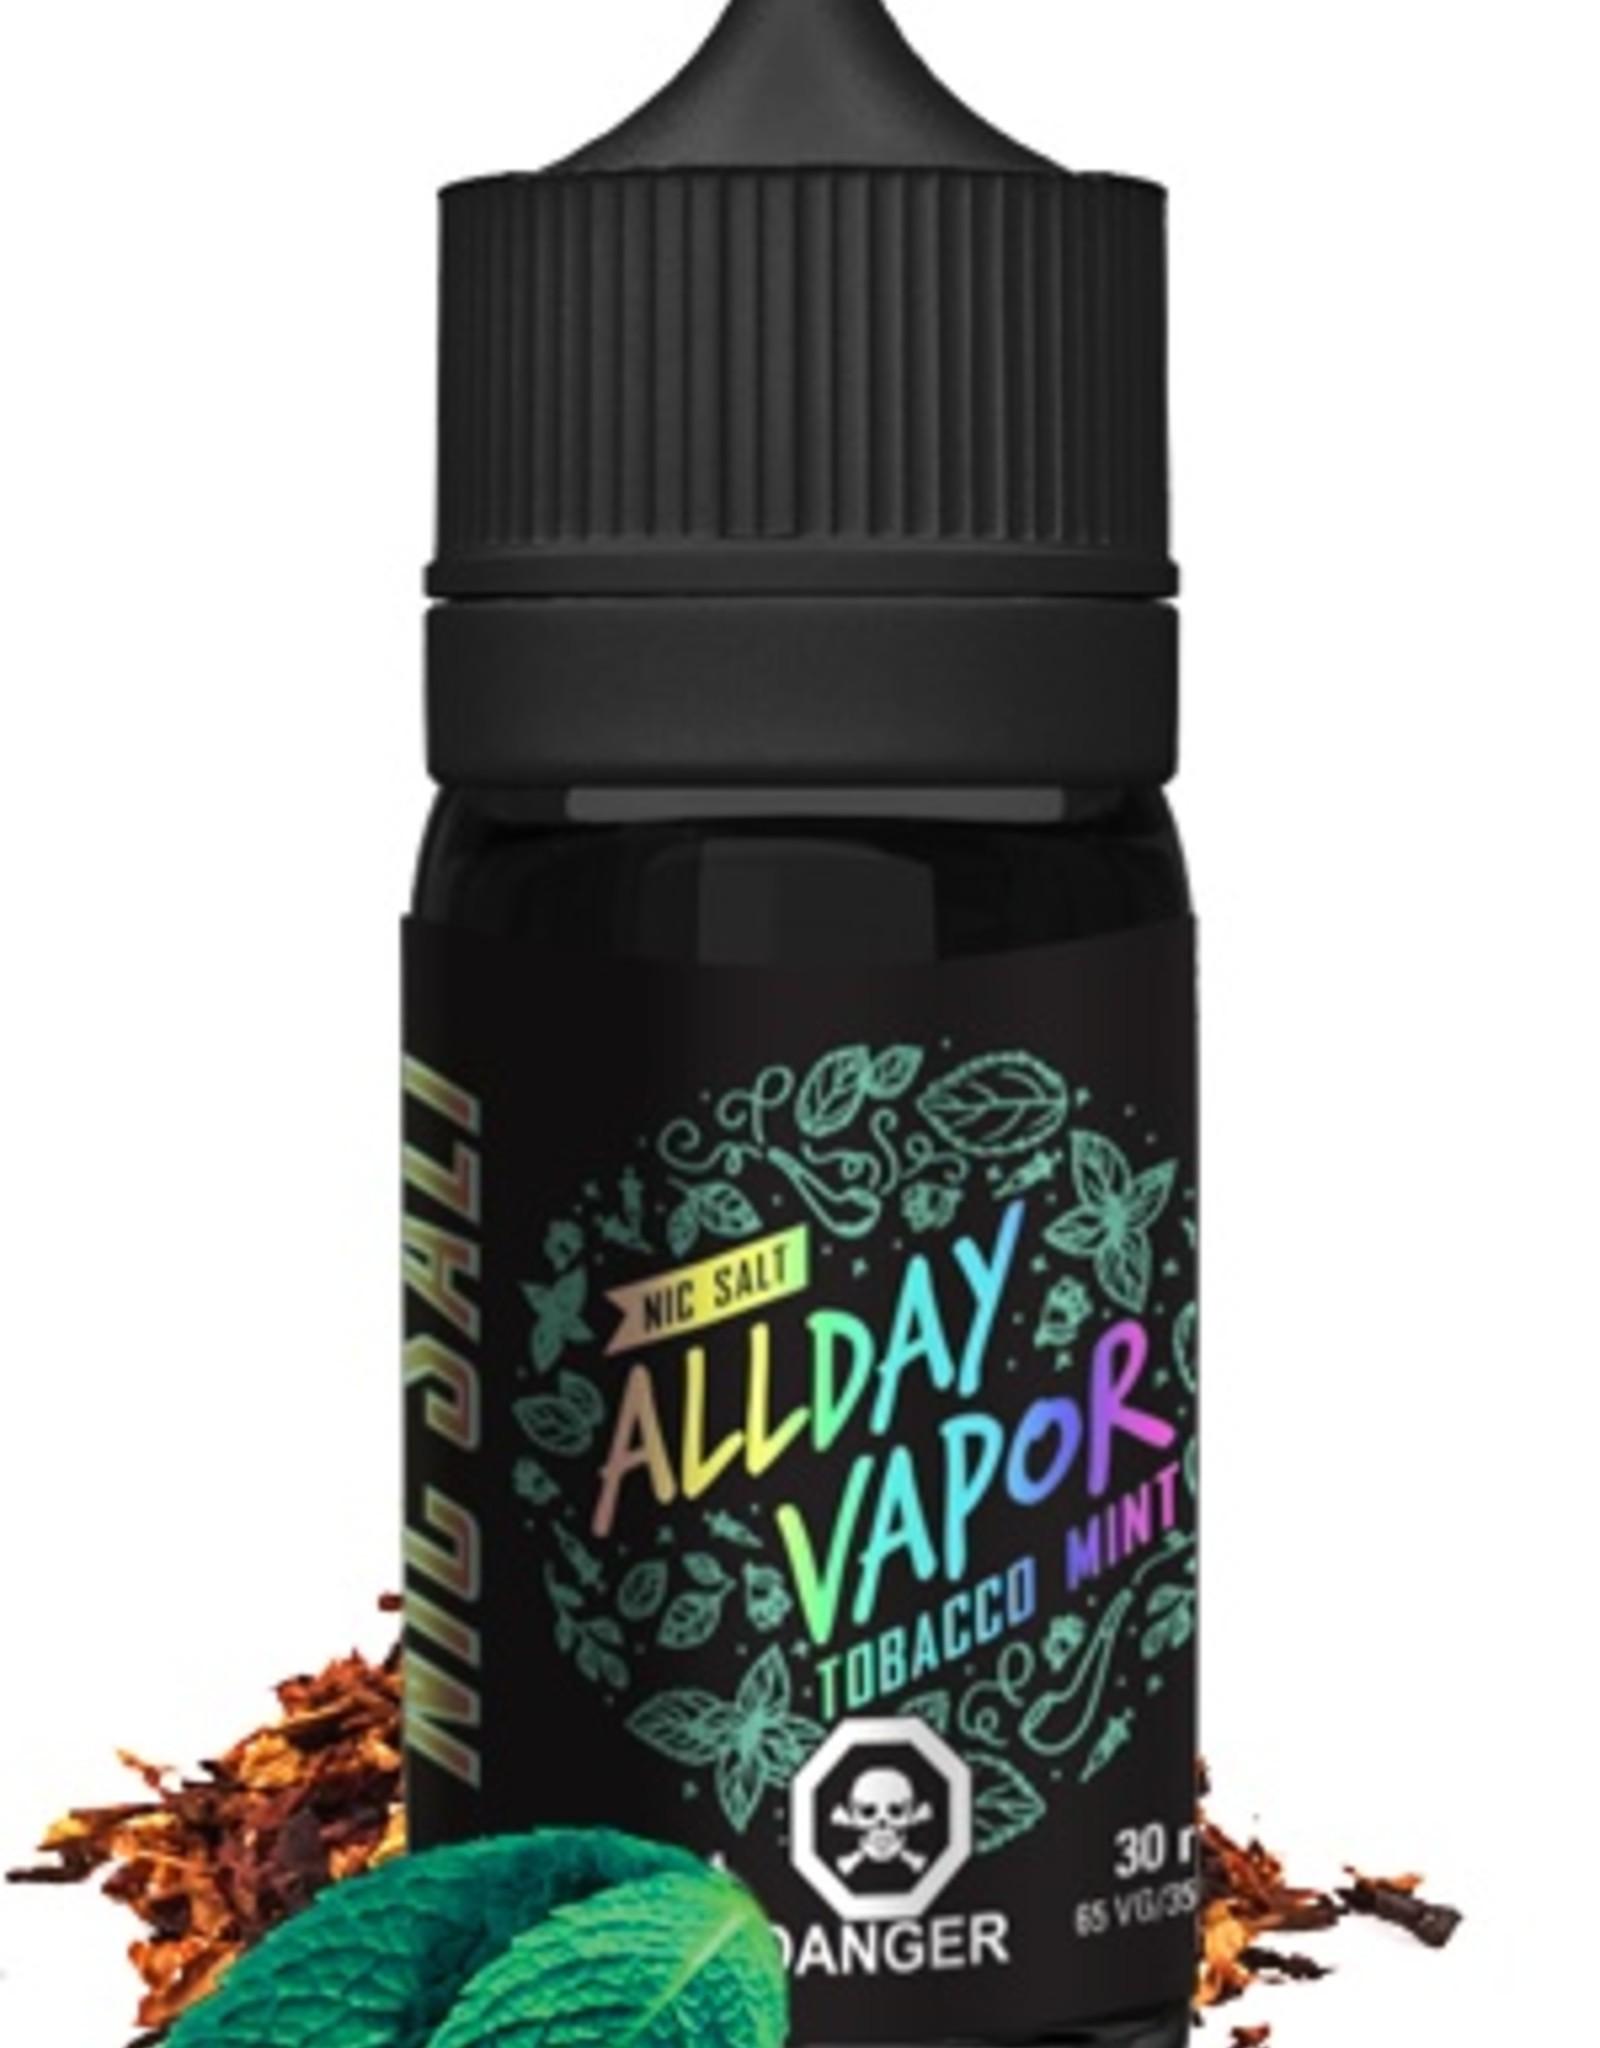 Nic Salt ALLDAY VAPOR Tobacco Mint (30mL)